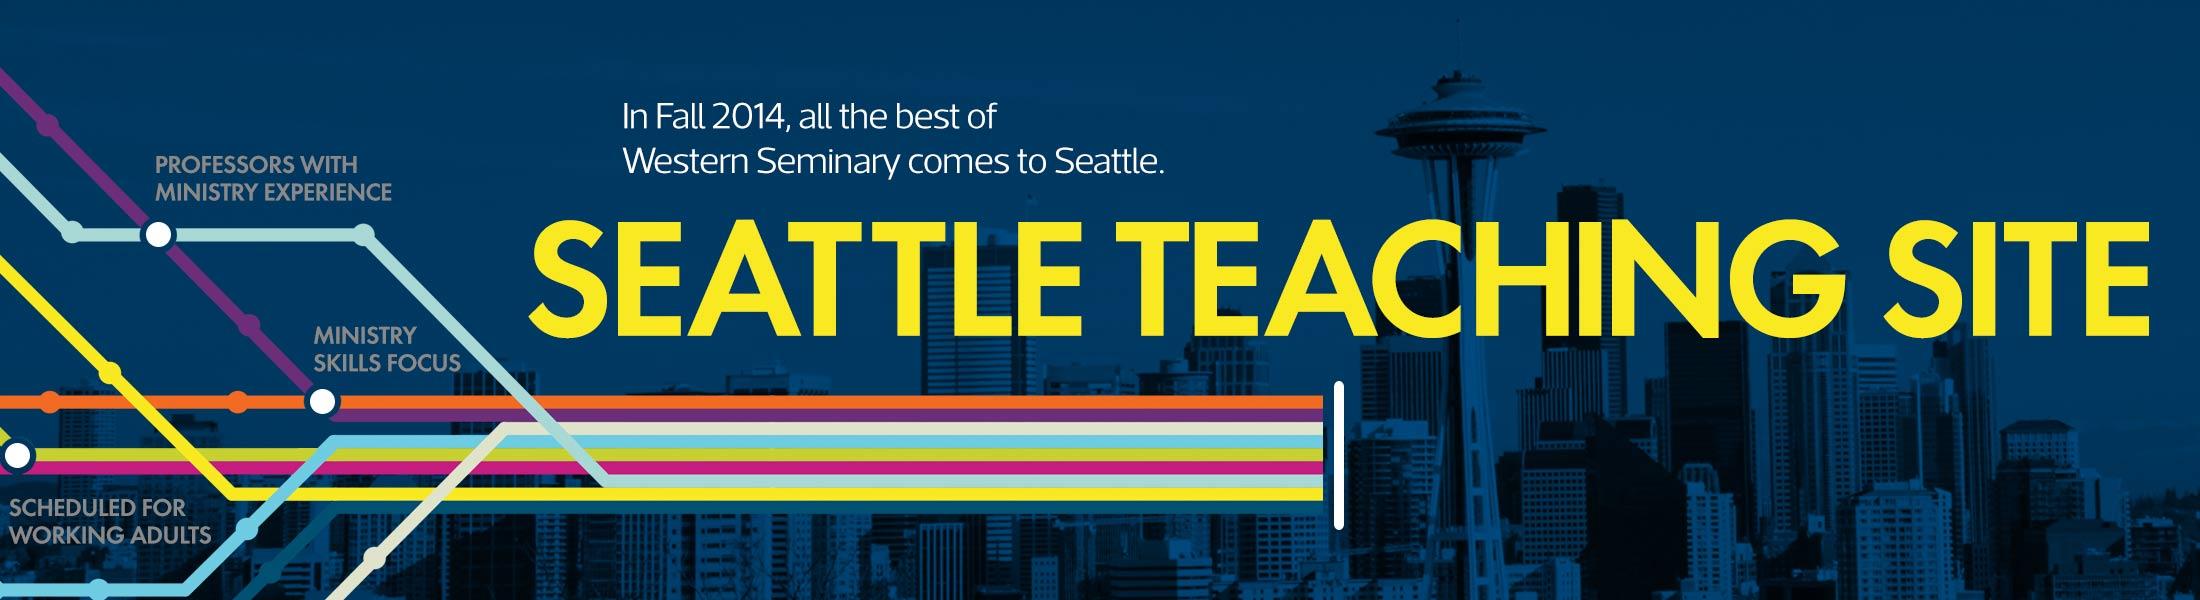 Western Seminary Seattle Teaching Site Banner